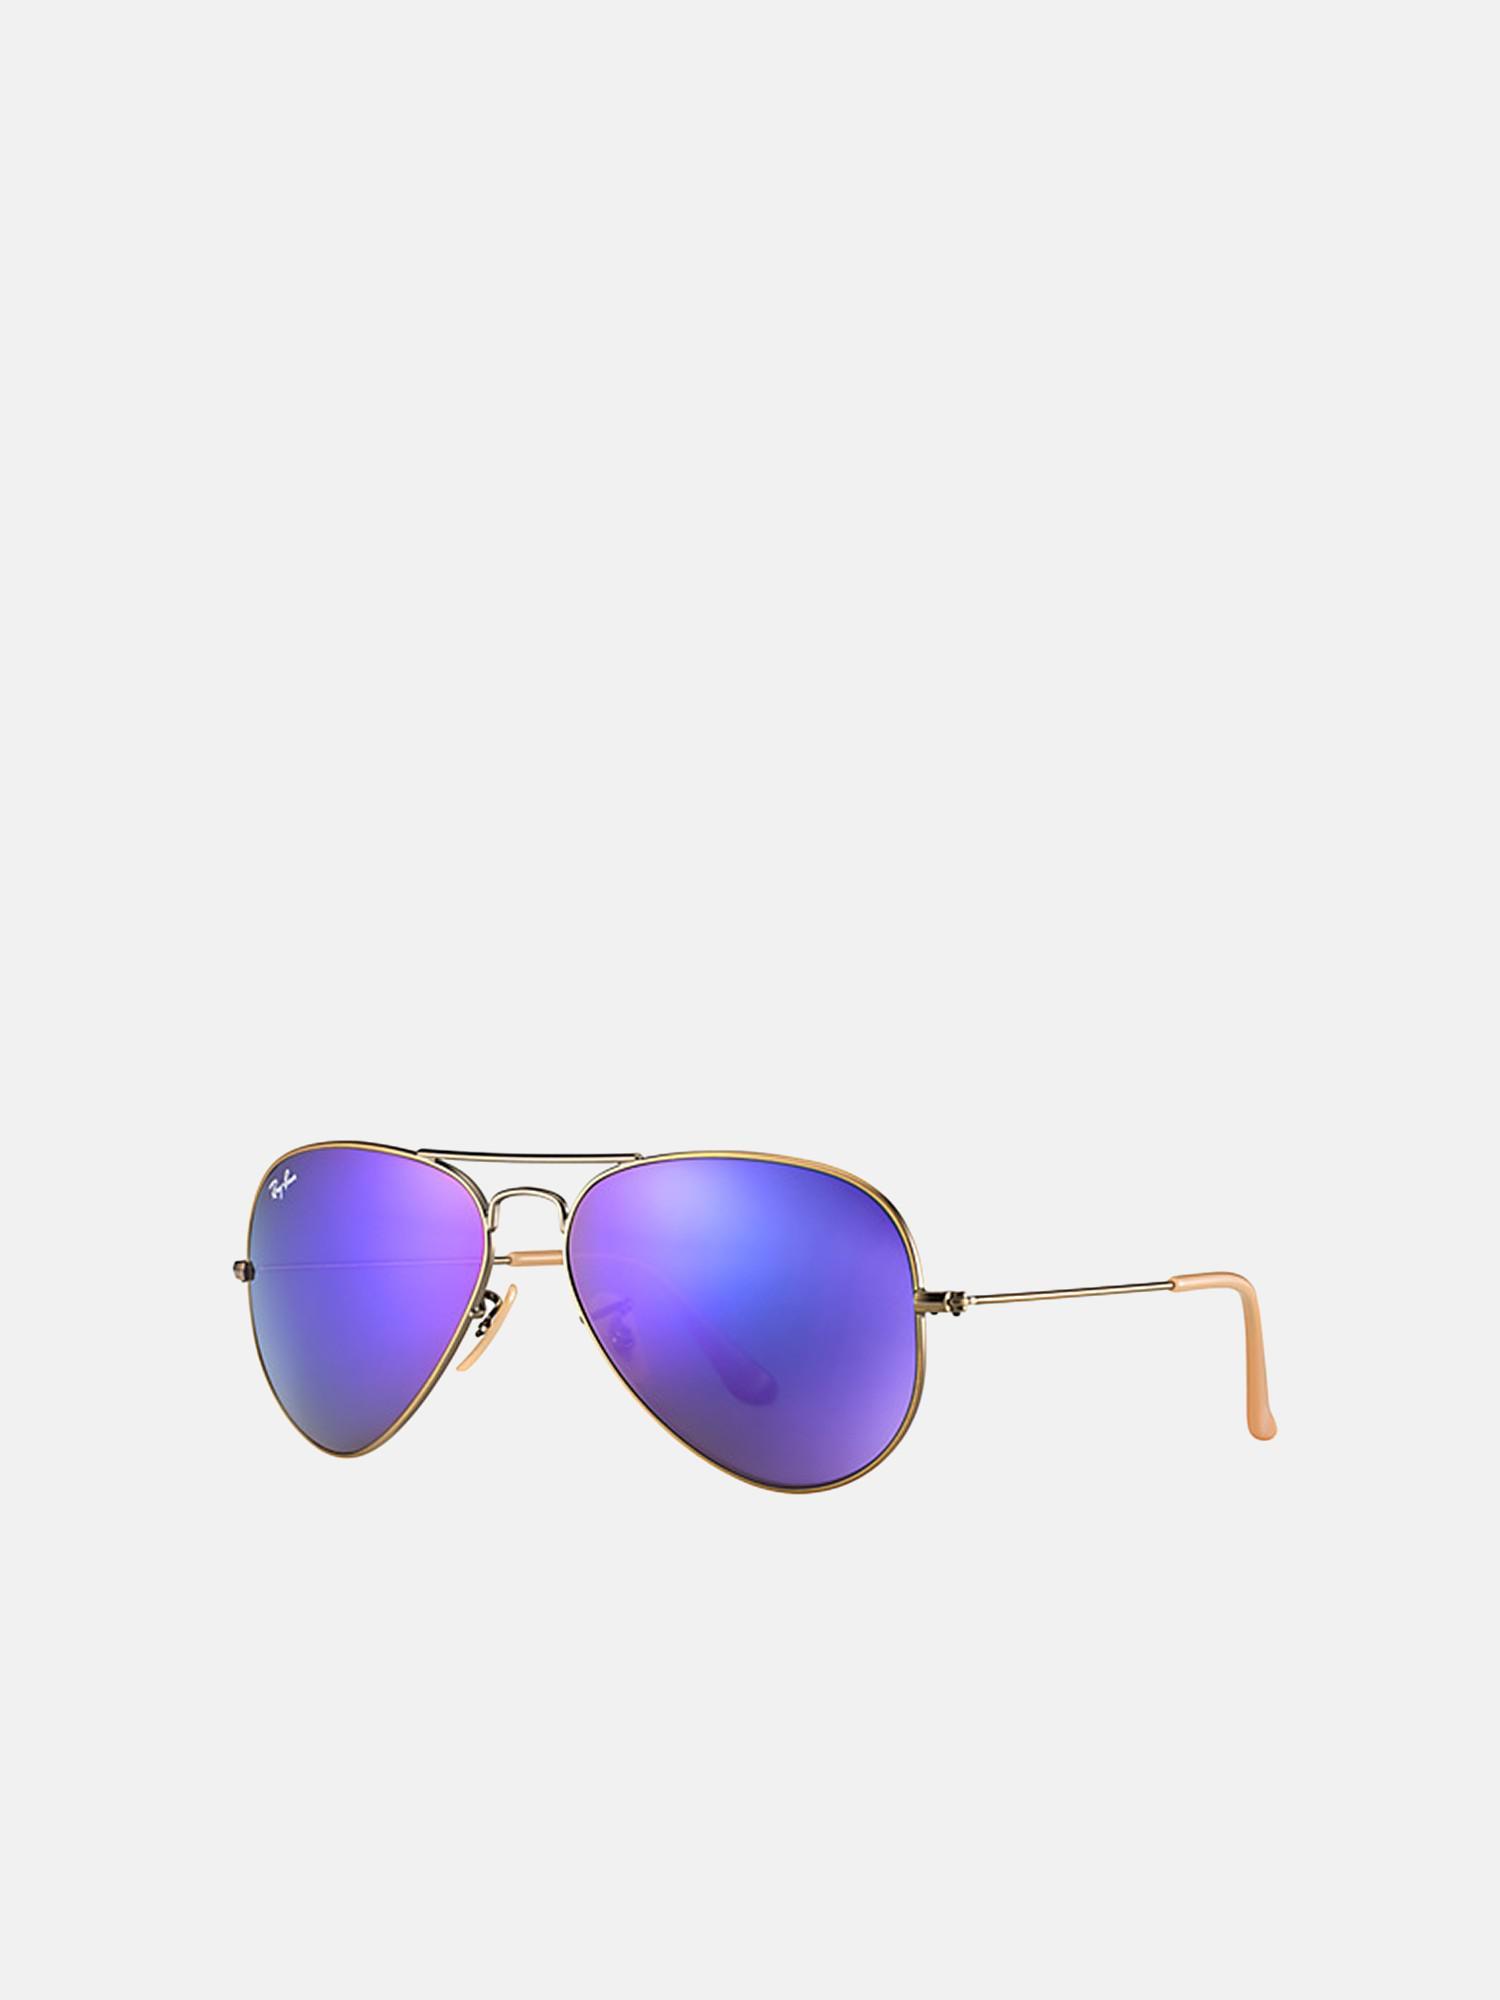 e89dbed2e5 Lyst - Ray-Ban Aviator Frame Sunglasses in Purple - Save 12%